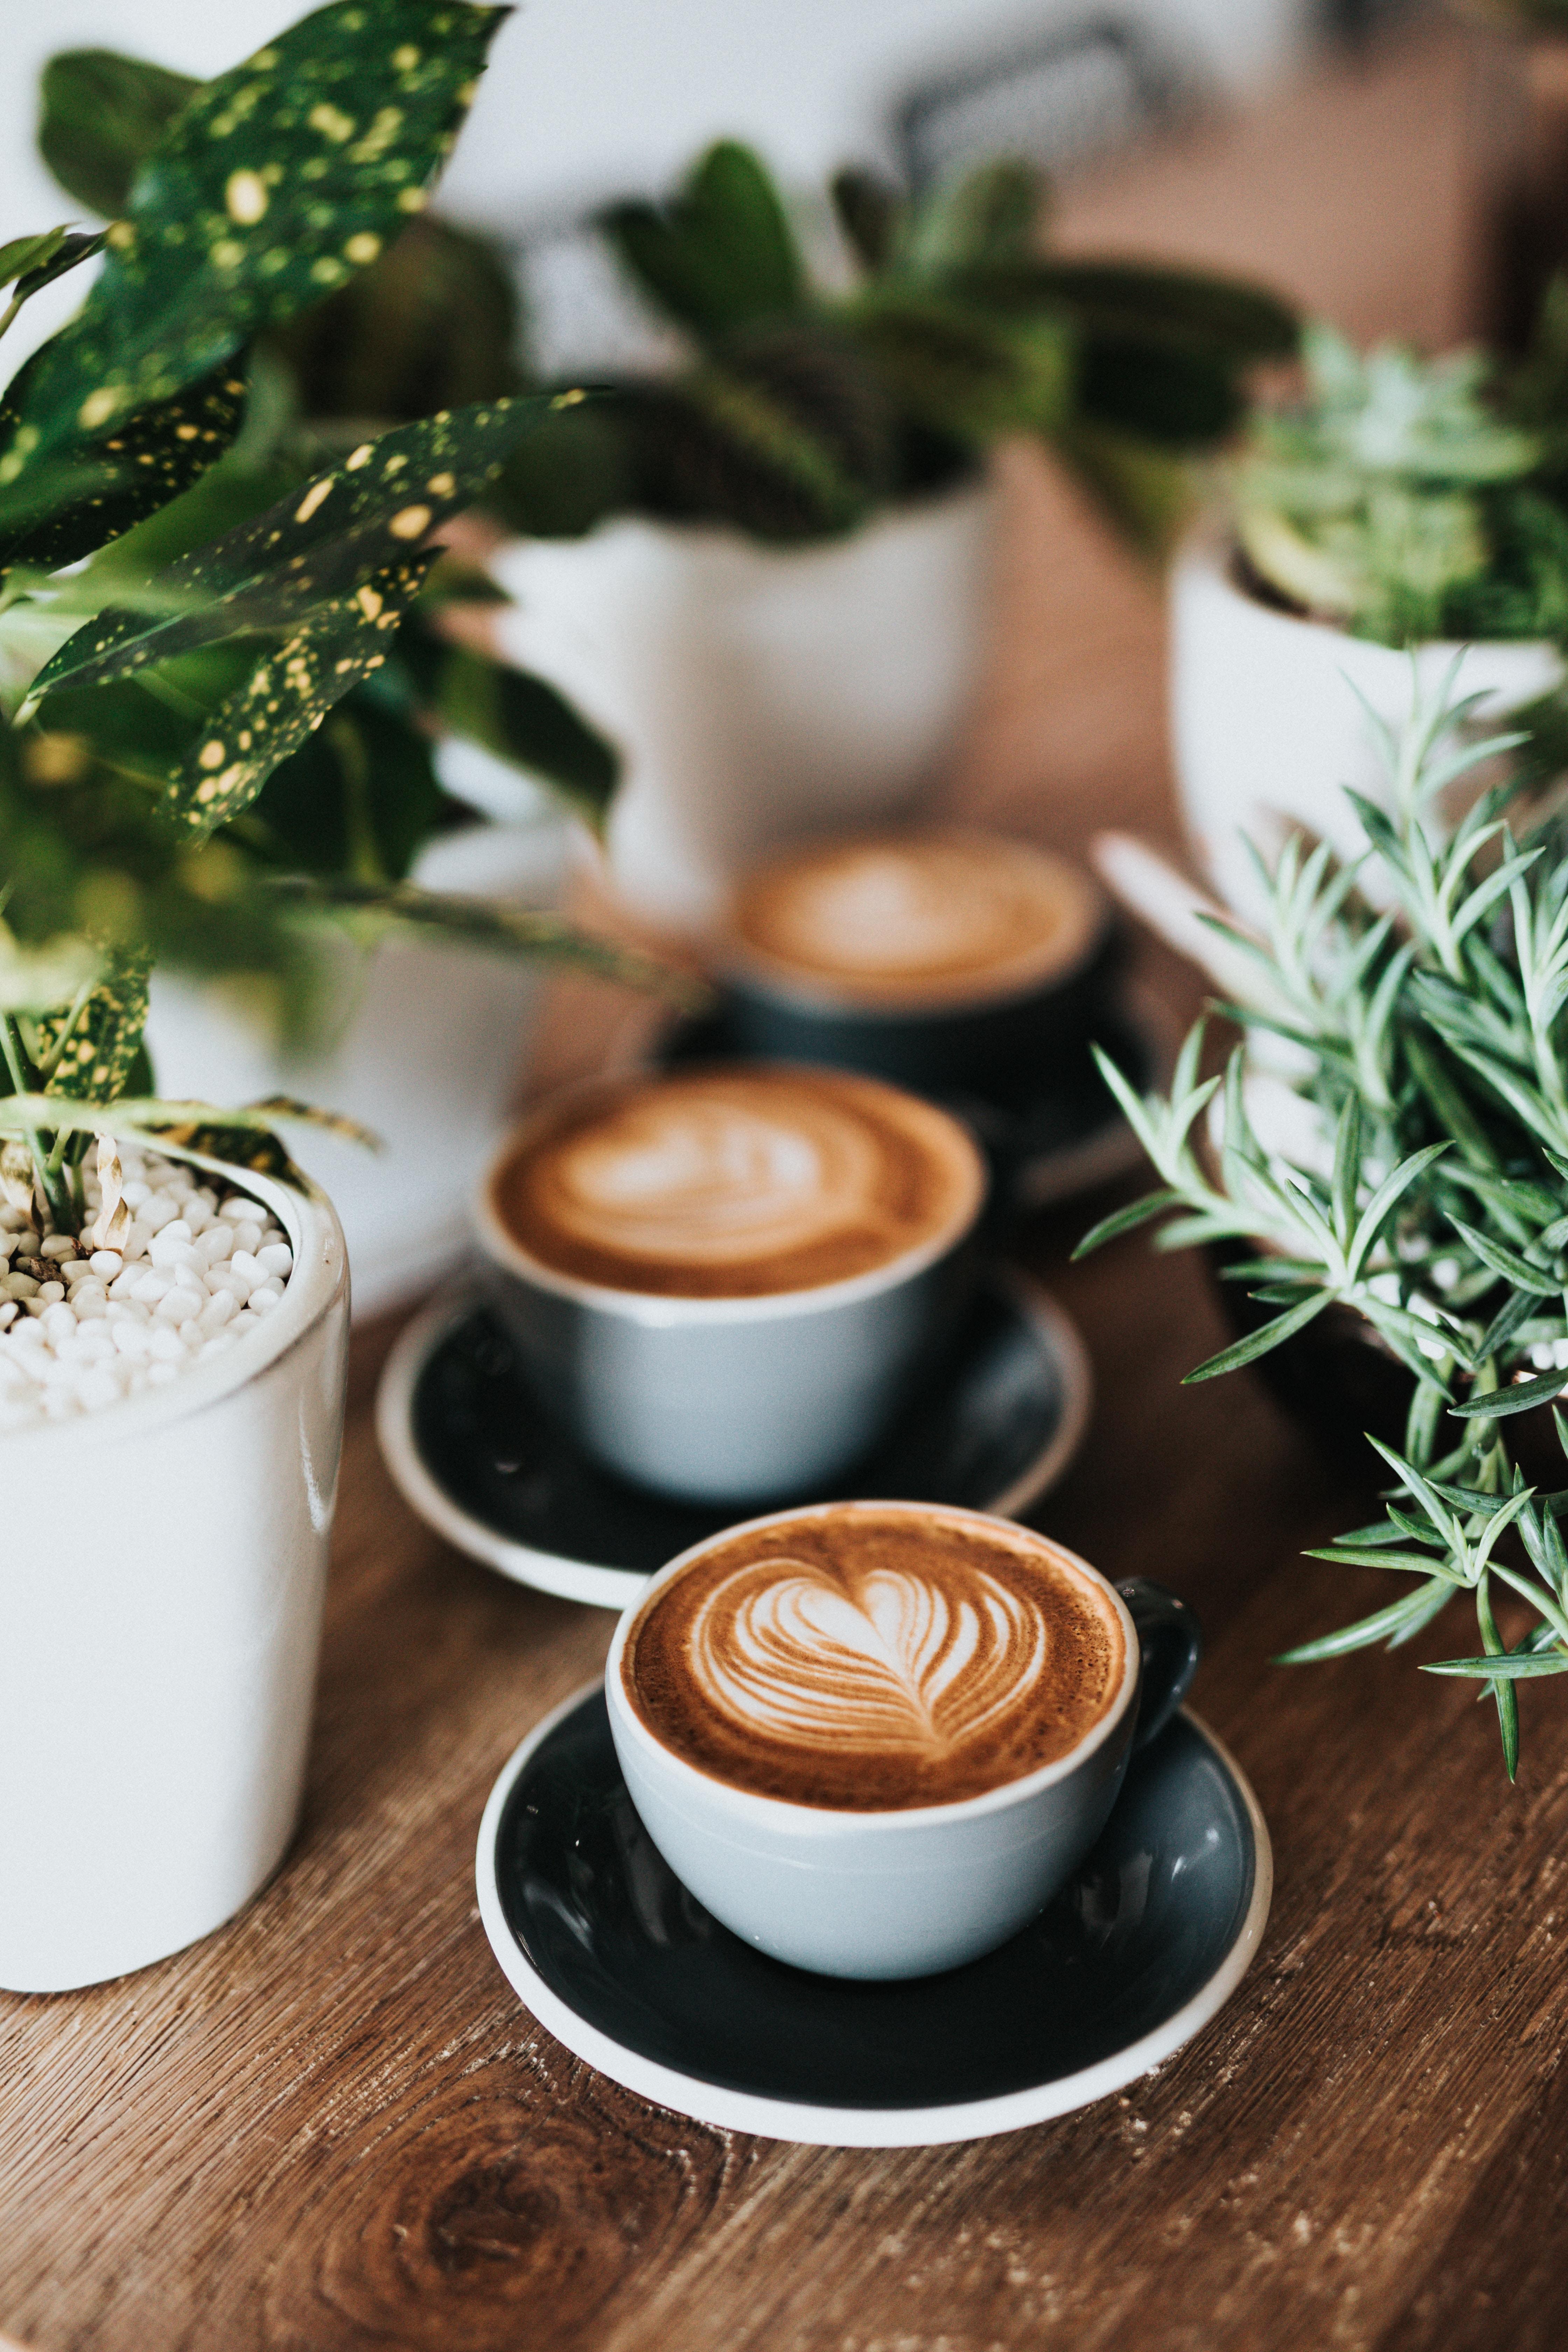 Costa Getränkepaket - Kaffee